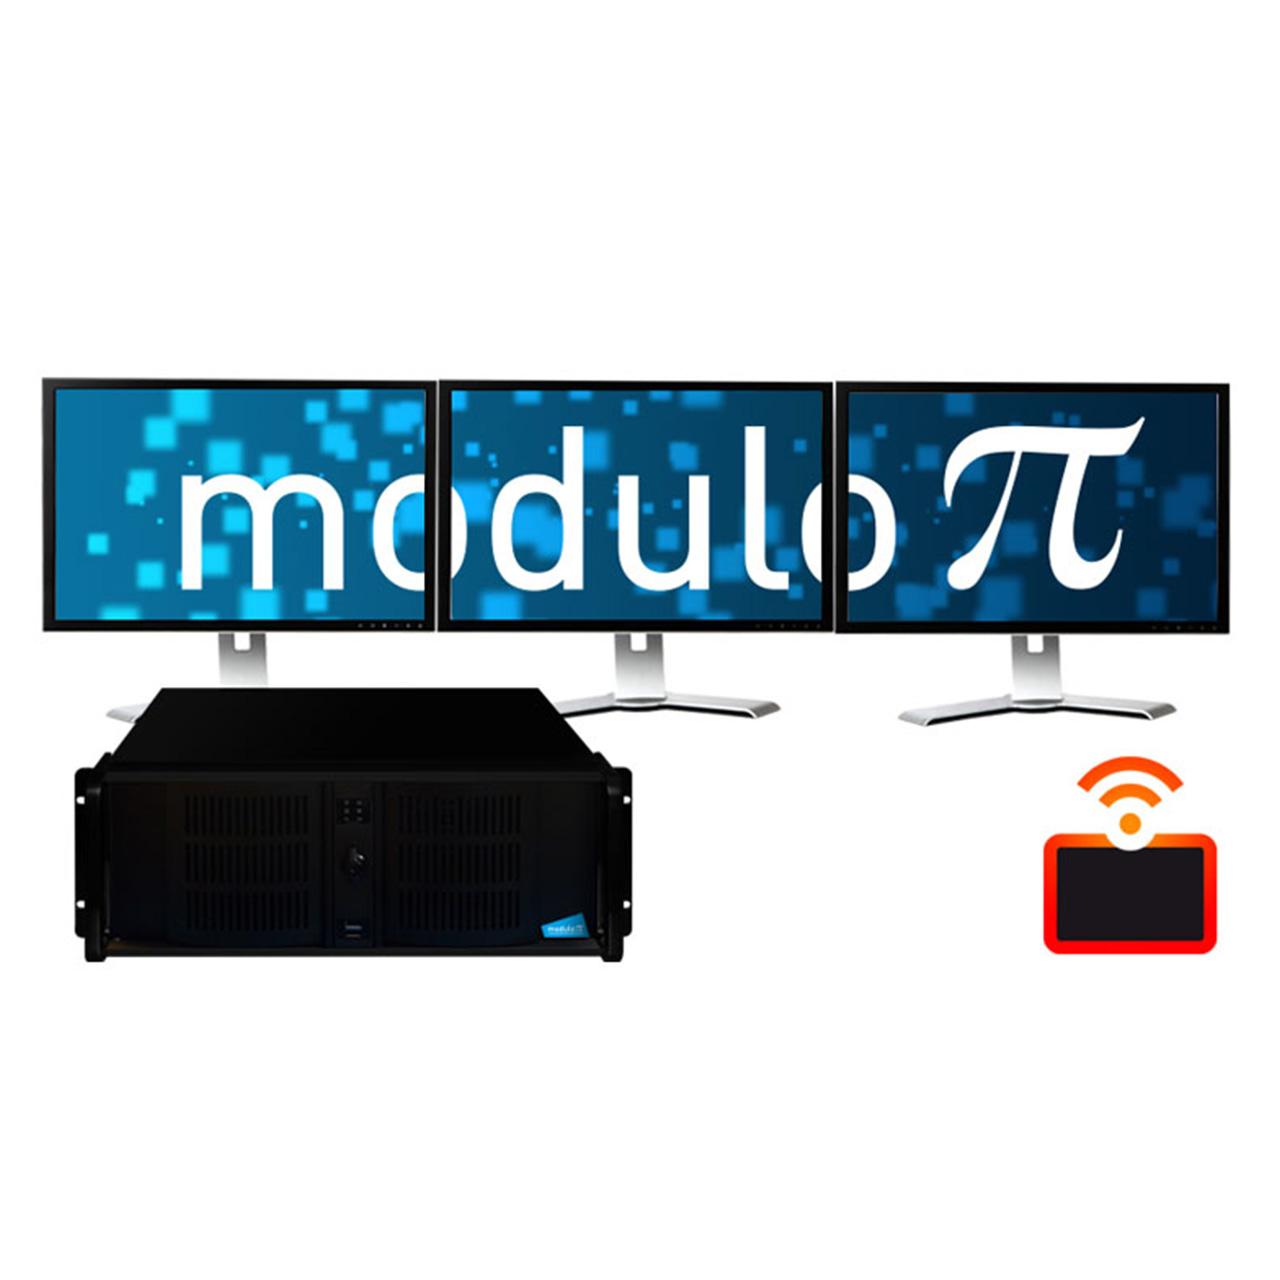 Modulo-Pi-advertising.jpg